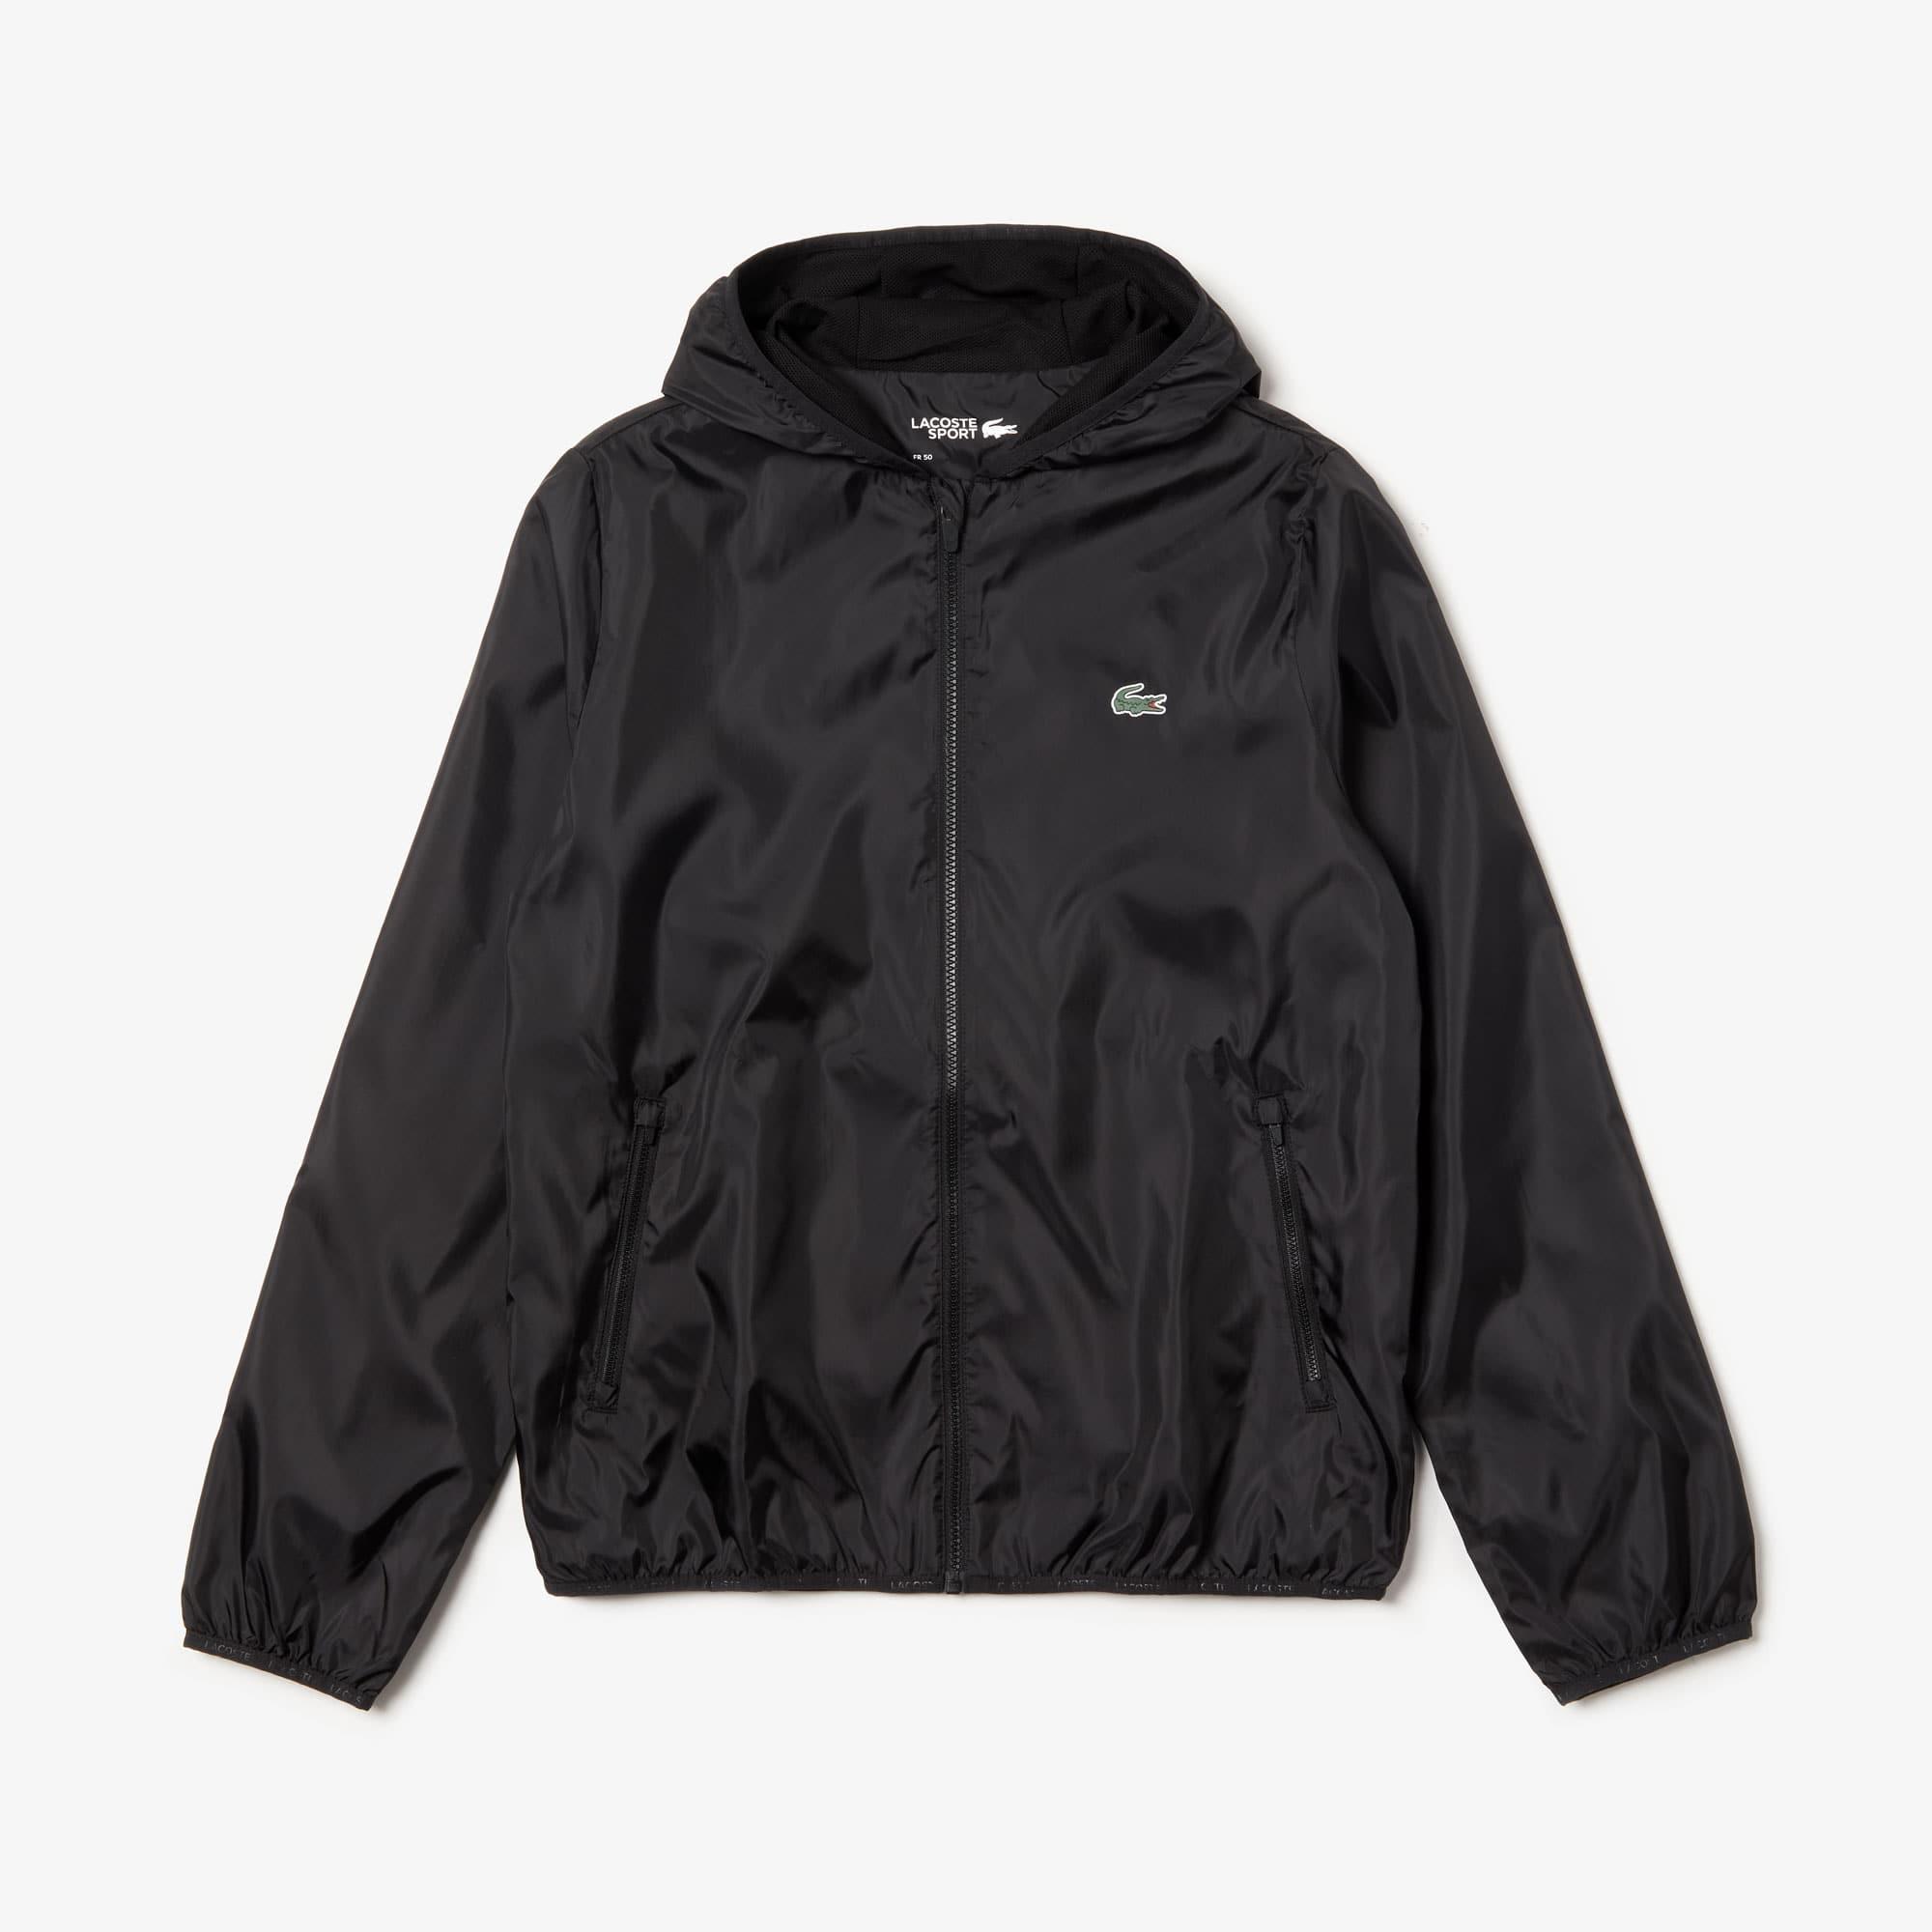 a3c1096e0 Jackets & Coats | Men's Fashion | LACOSTE